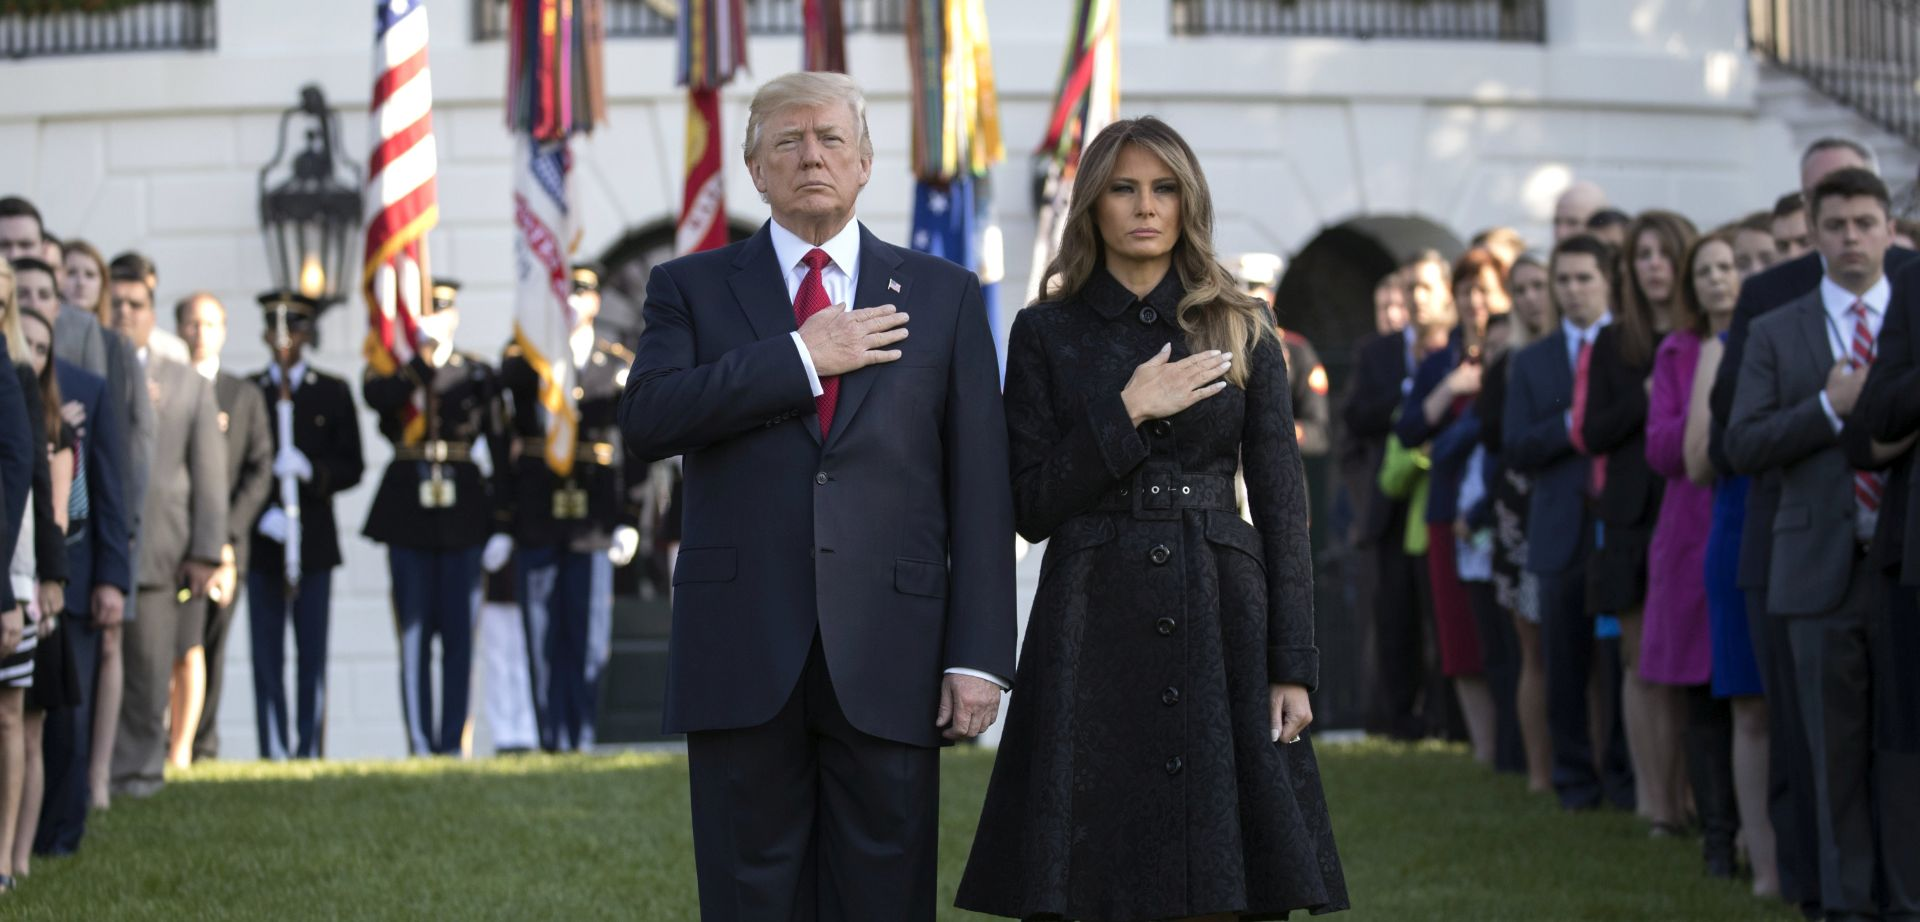 Trump minutom šutnje odao počast žrtvama napada 11. rujna